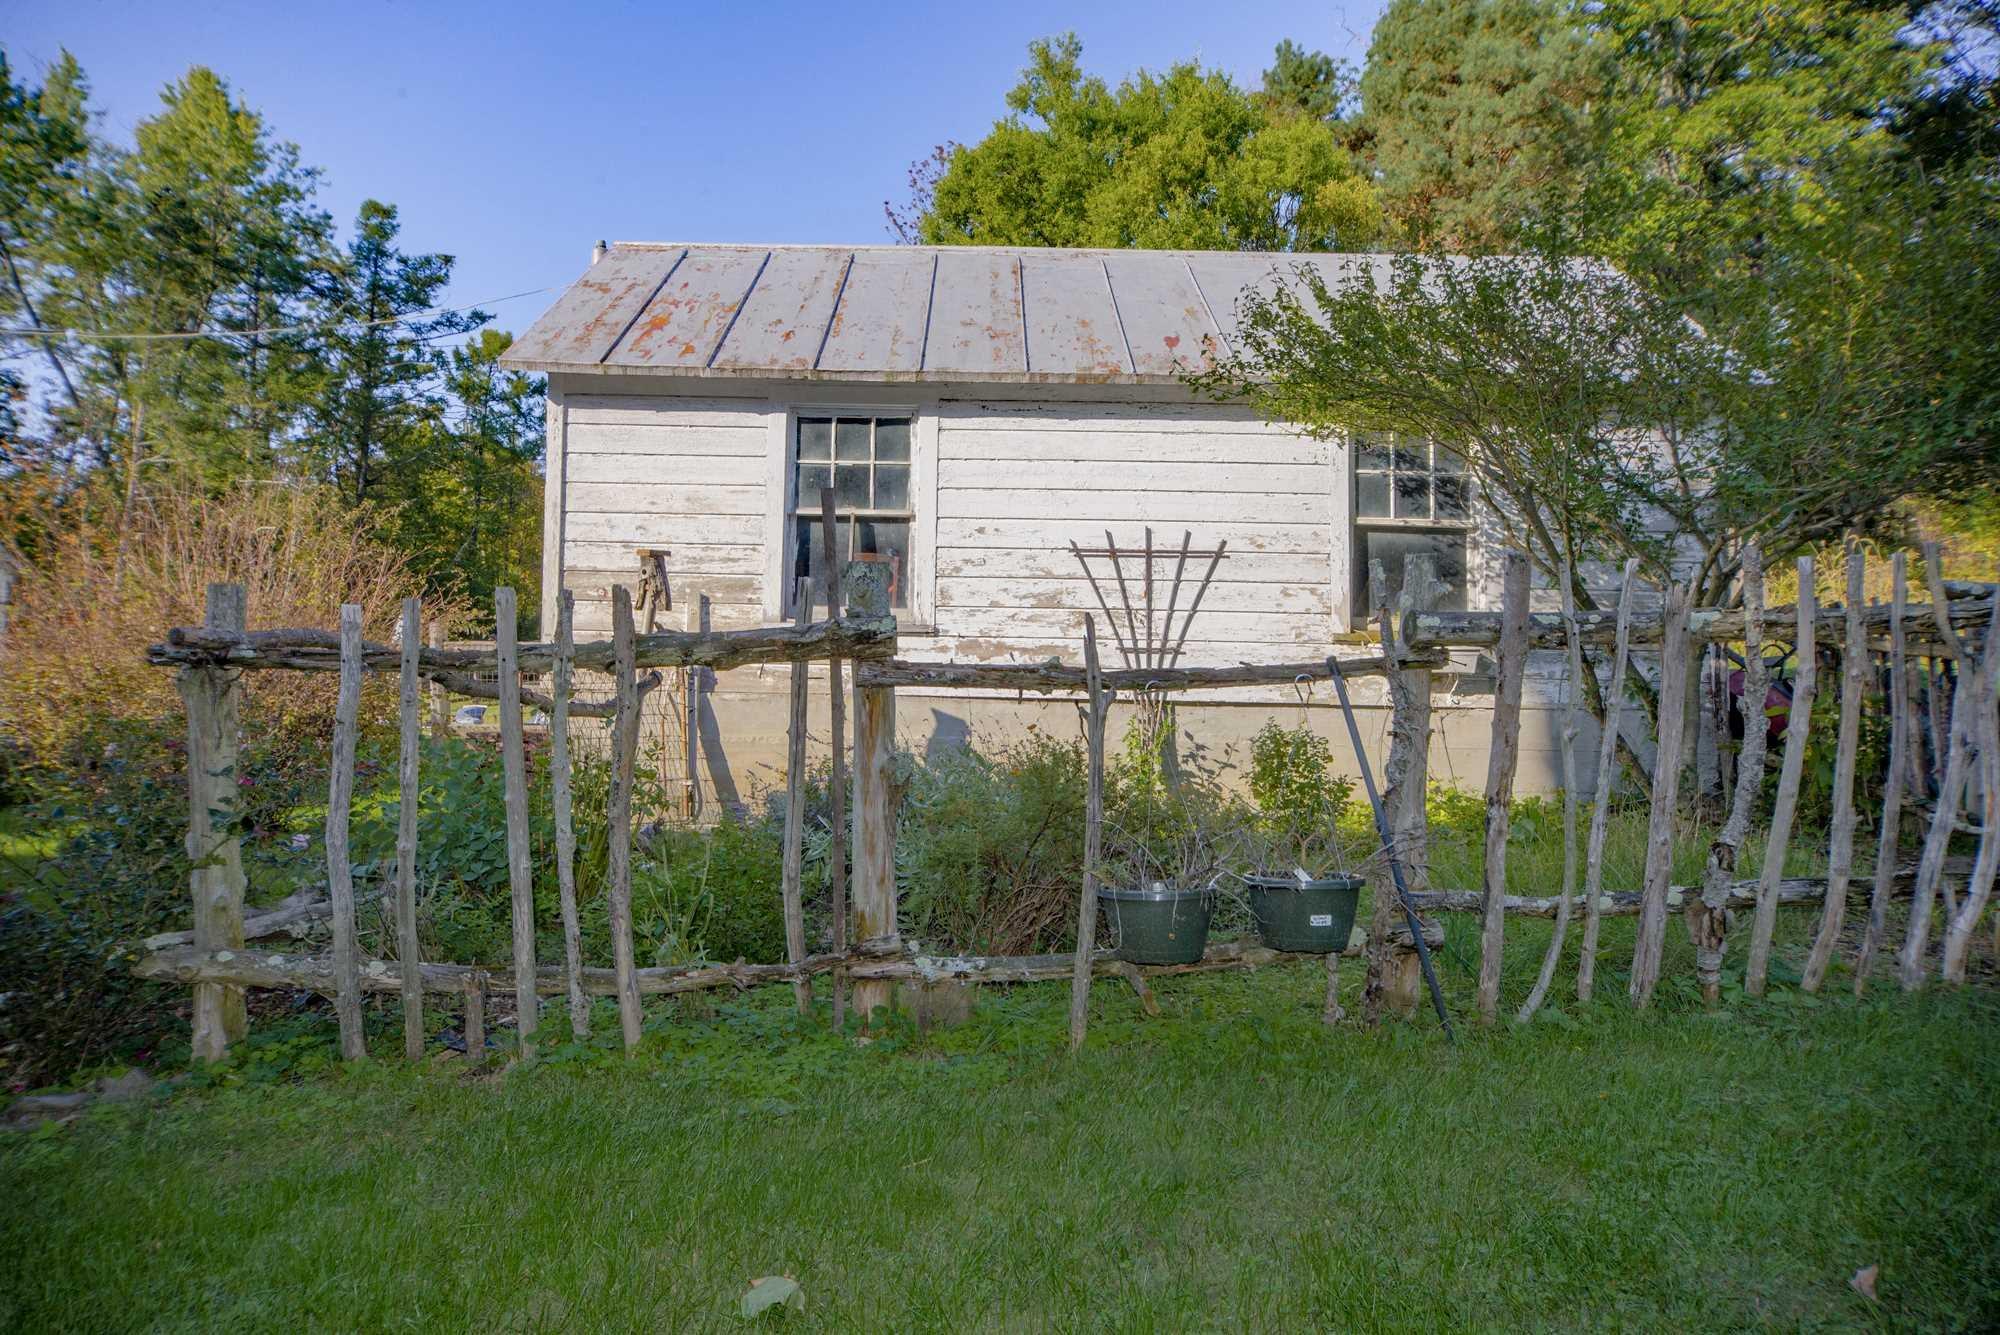 Additional photo for property listing at 301 DEER HAVEN ROAD 301 DEER HAVEN ROAD Elizaville, New York 12523 United States